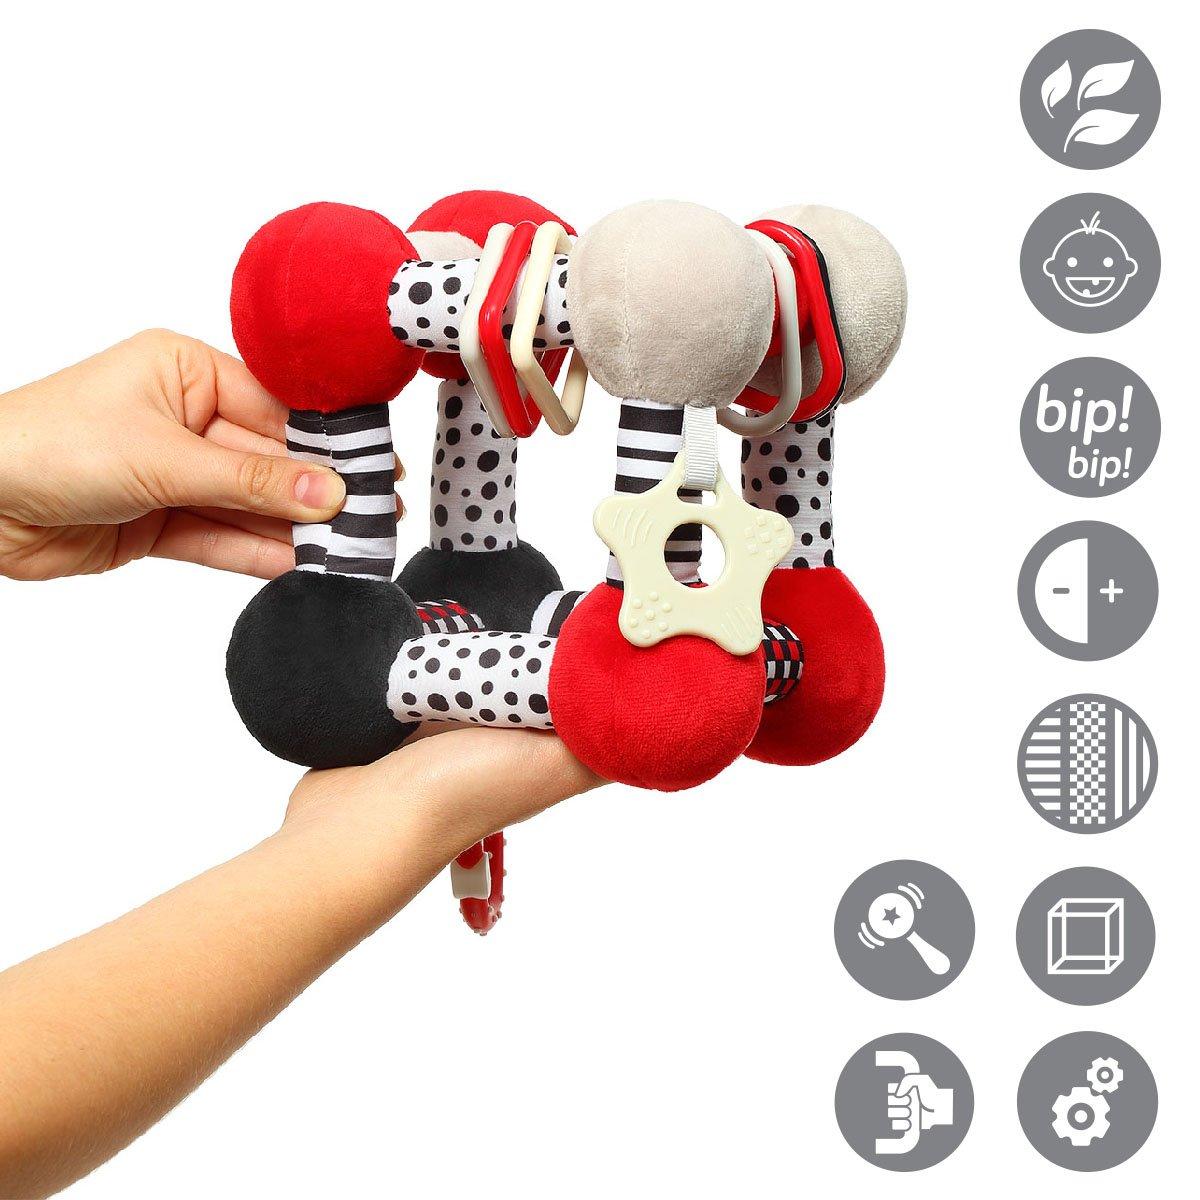 Edukaèní hraèka kostka TINY YOGA - zvìtšit obrázek